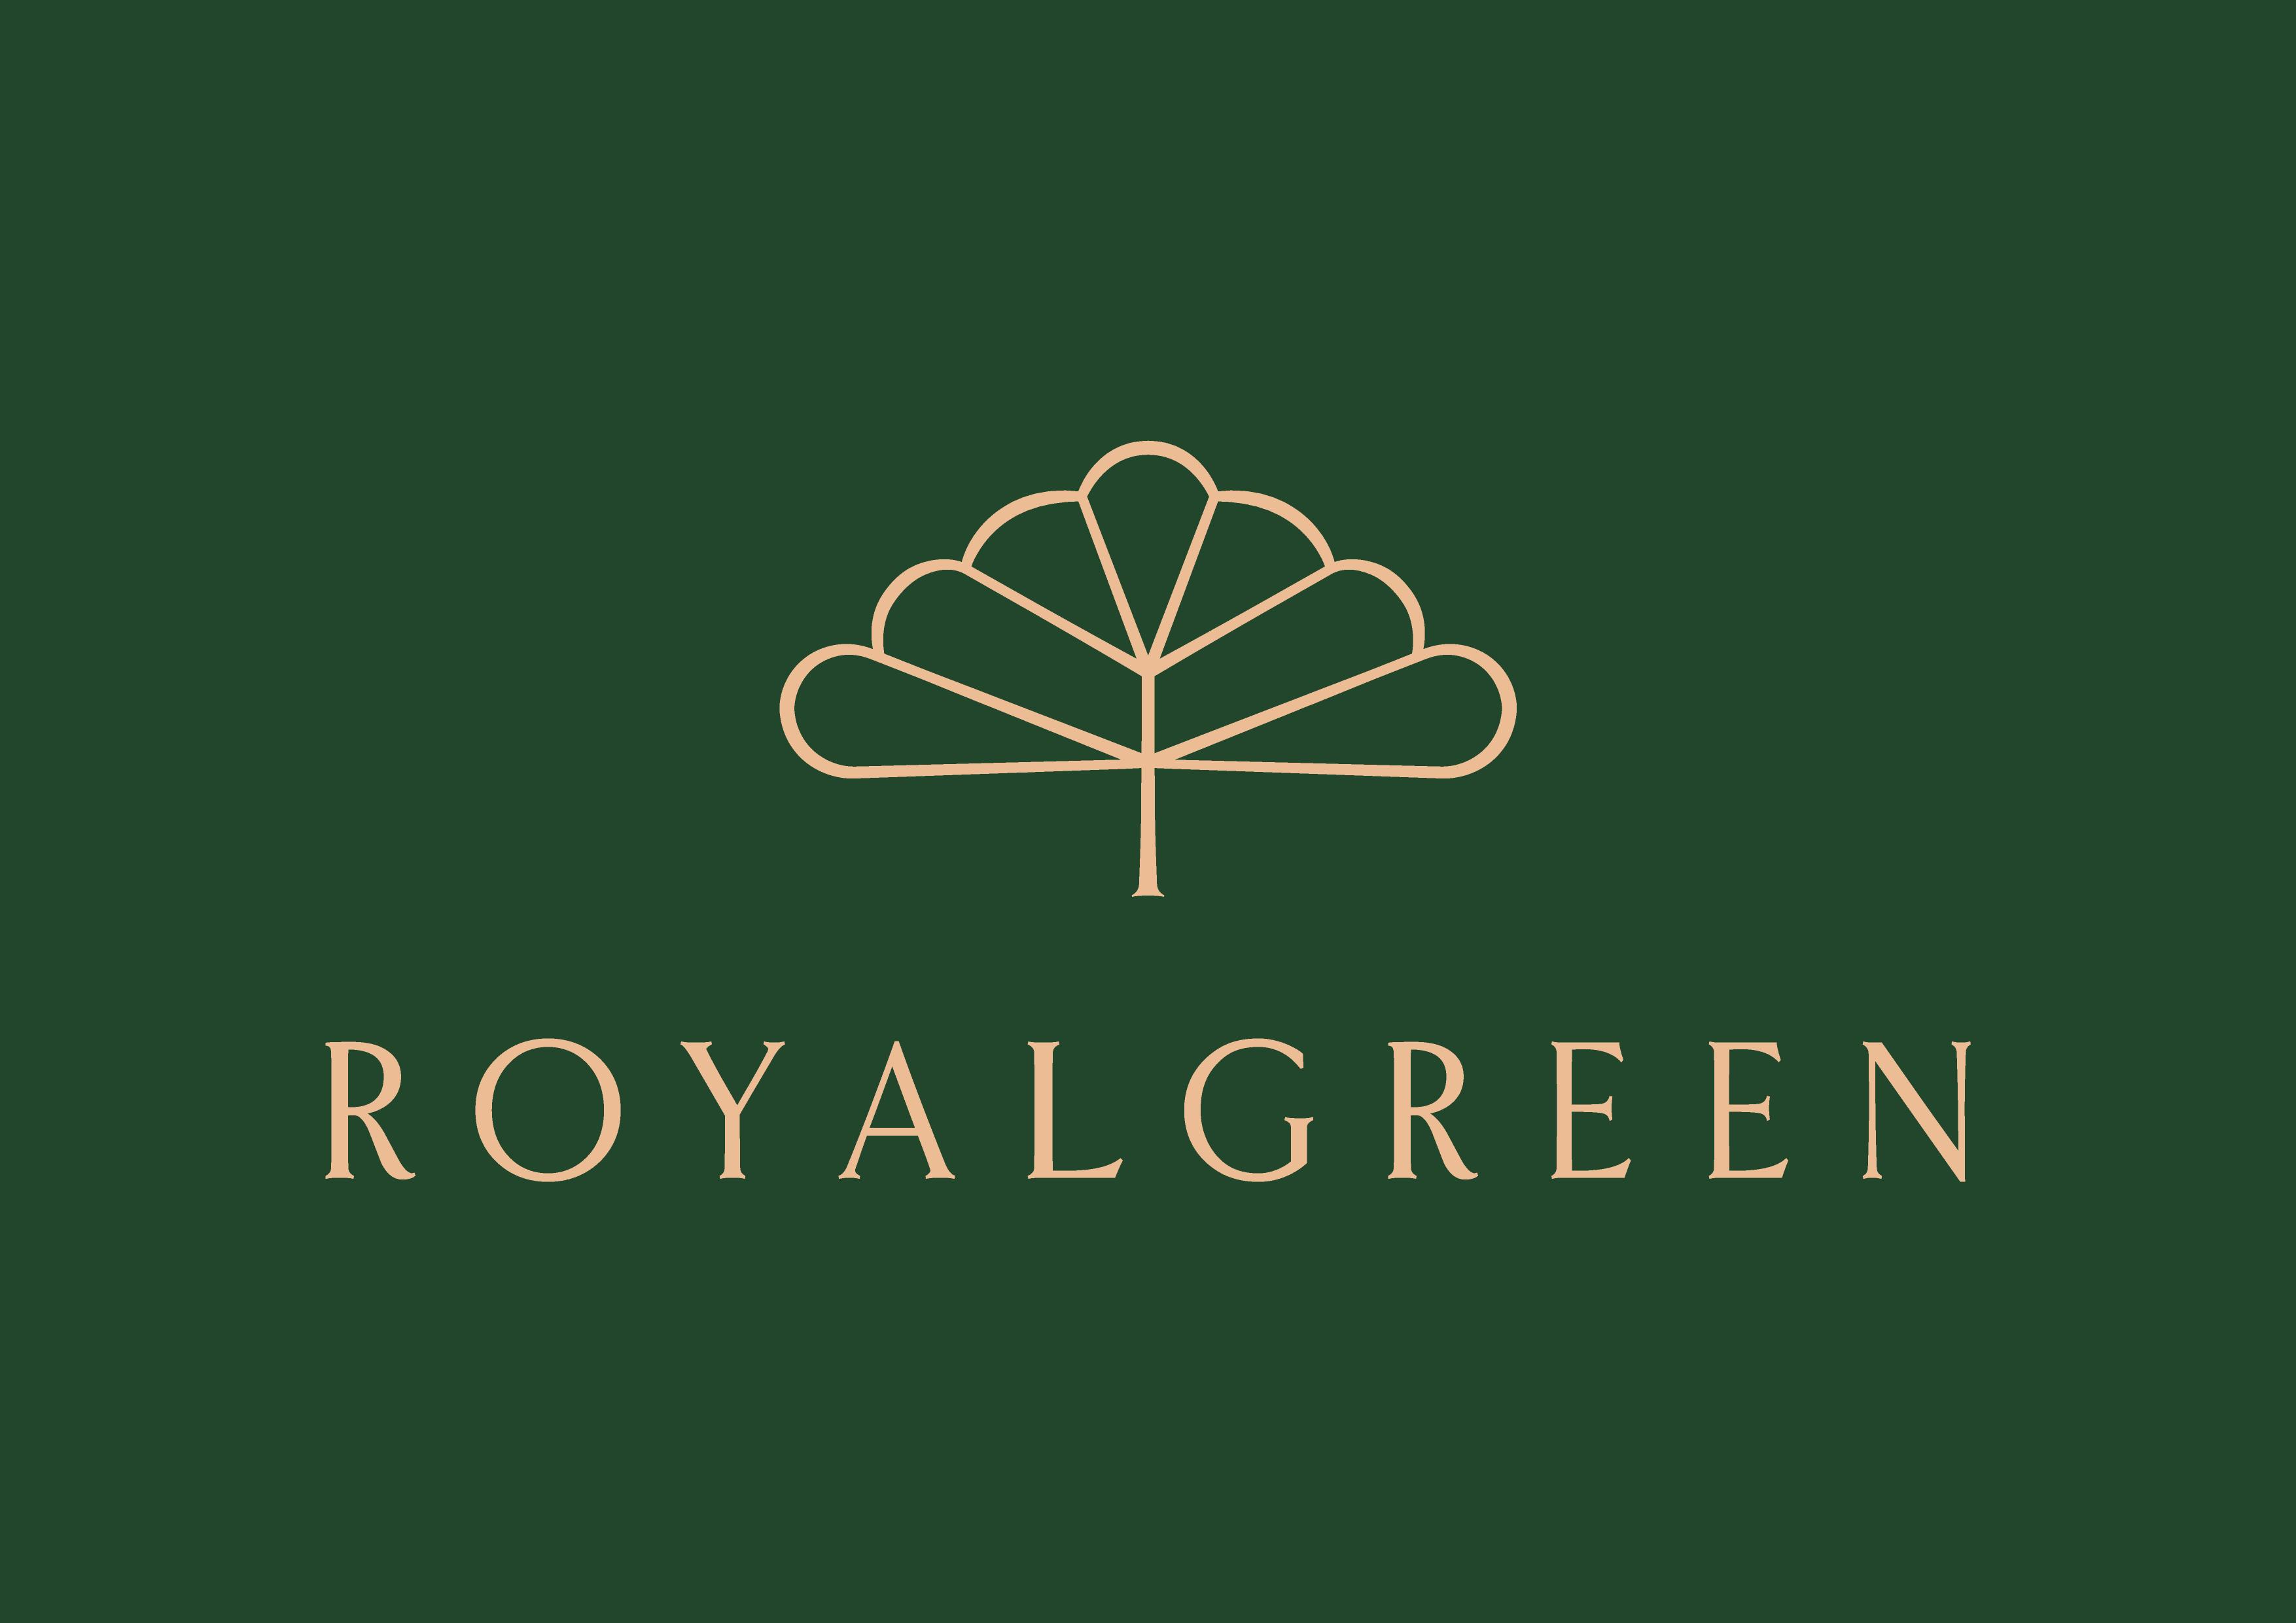 Royalgreen - Sky Top Investments Pte Ltd